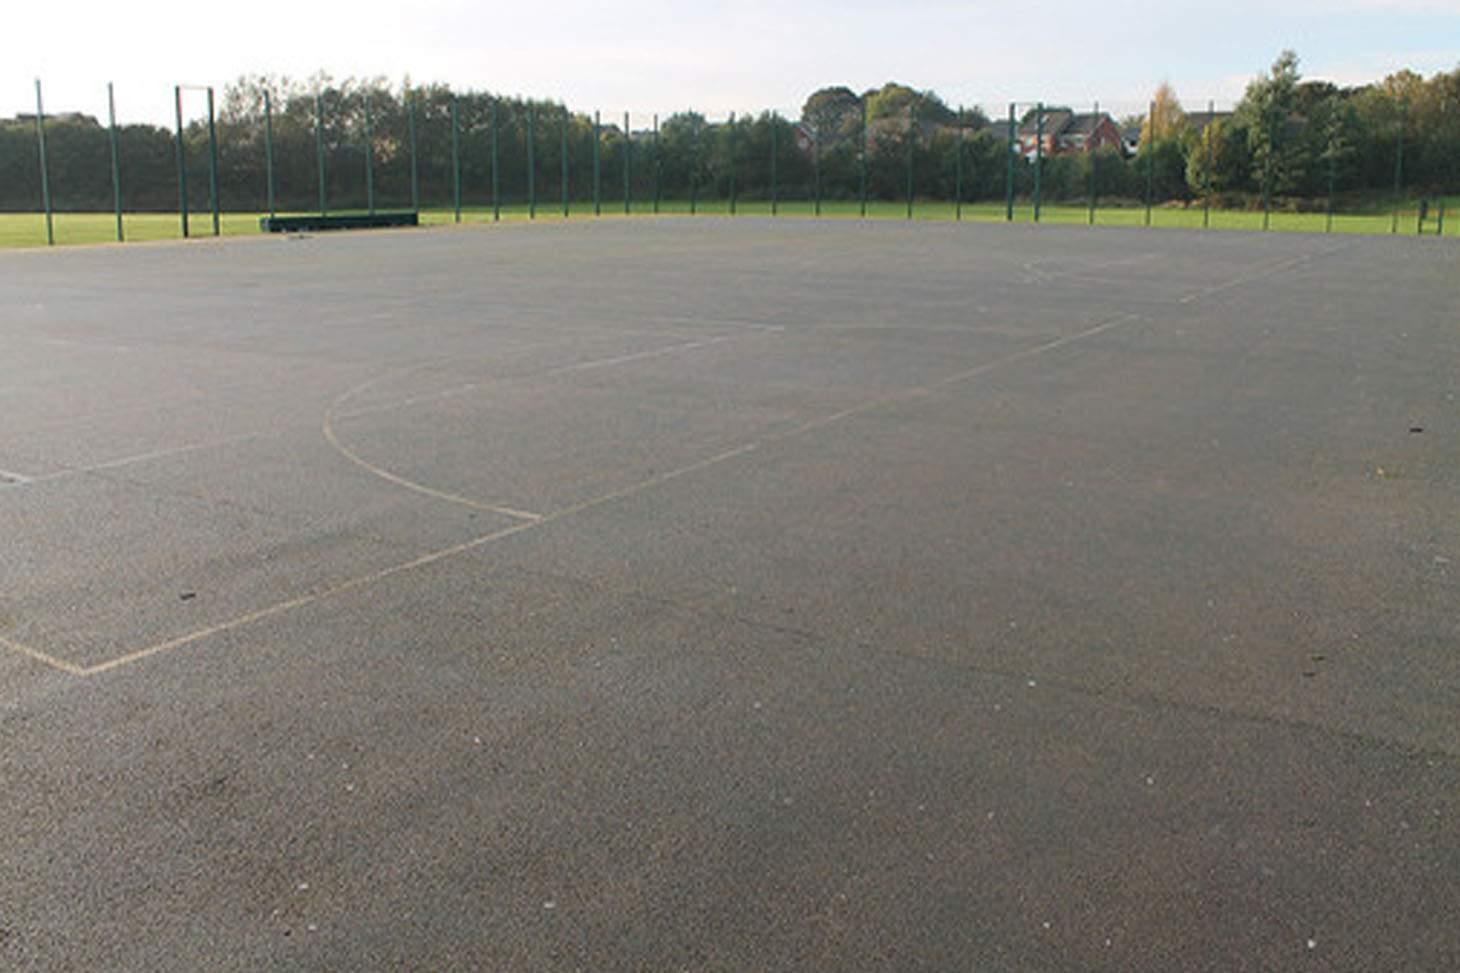 St. James's C of E High School Outdoor | Hard (macadam) tennis court